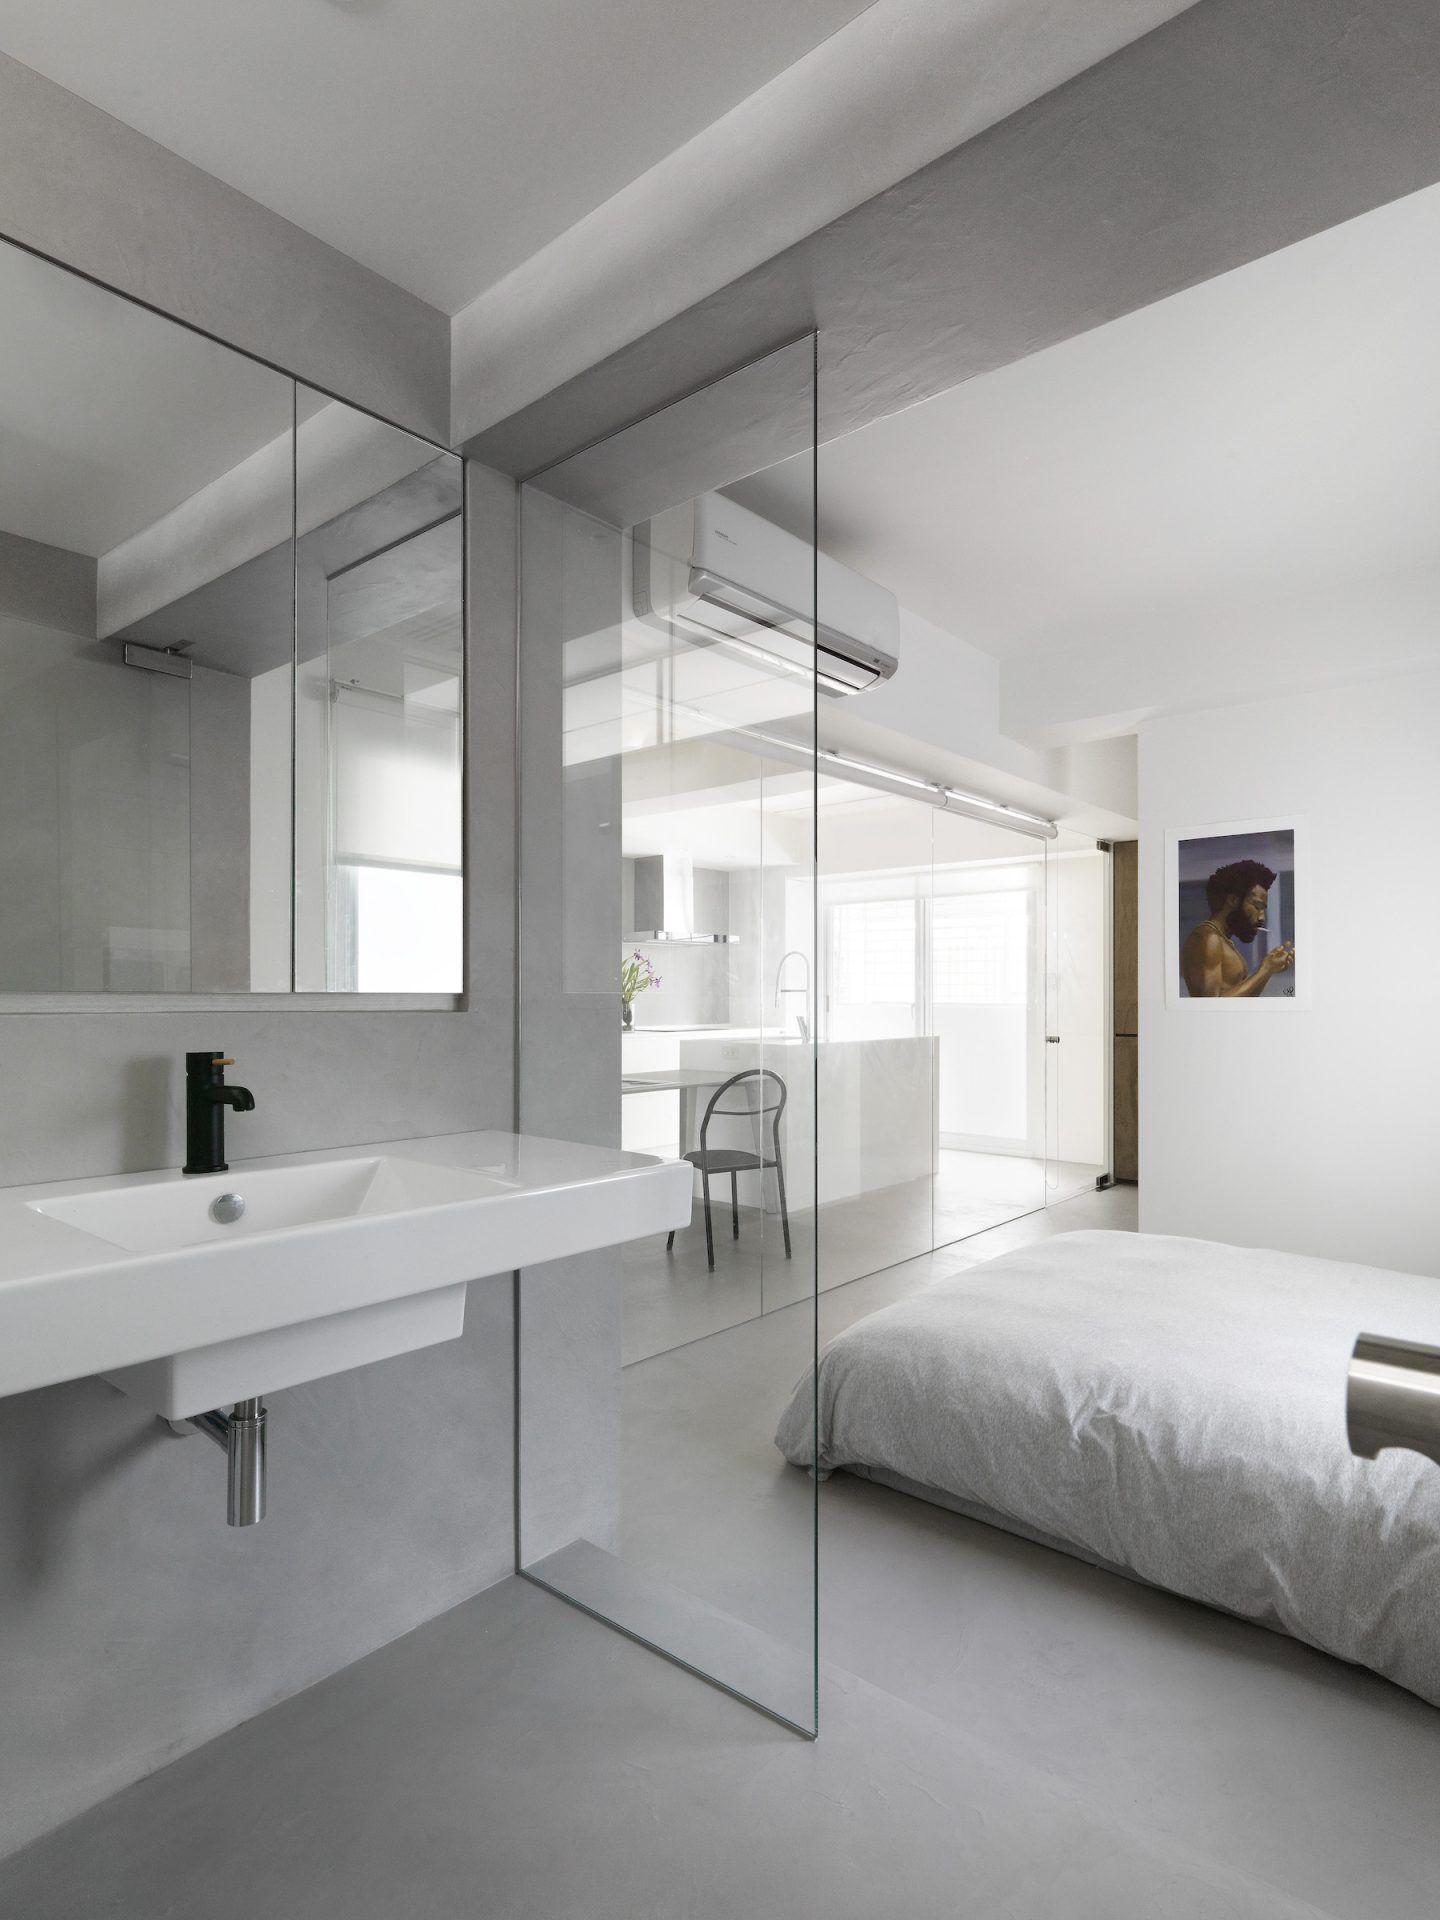 IGNANT-Design-Two-Books-Design-Changs-Apartment-08